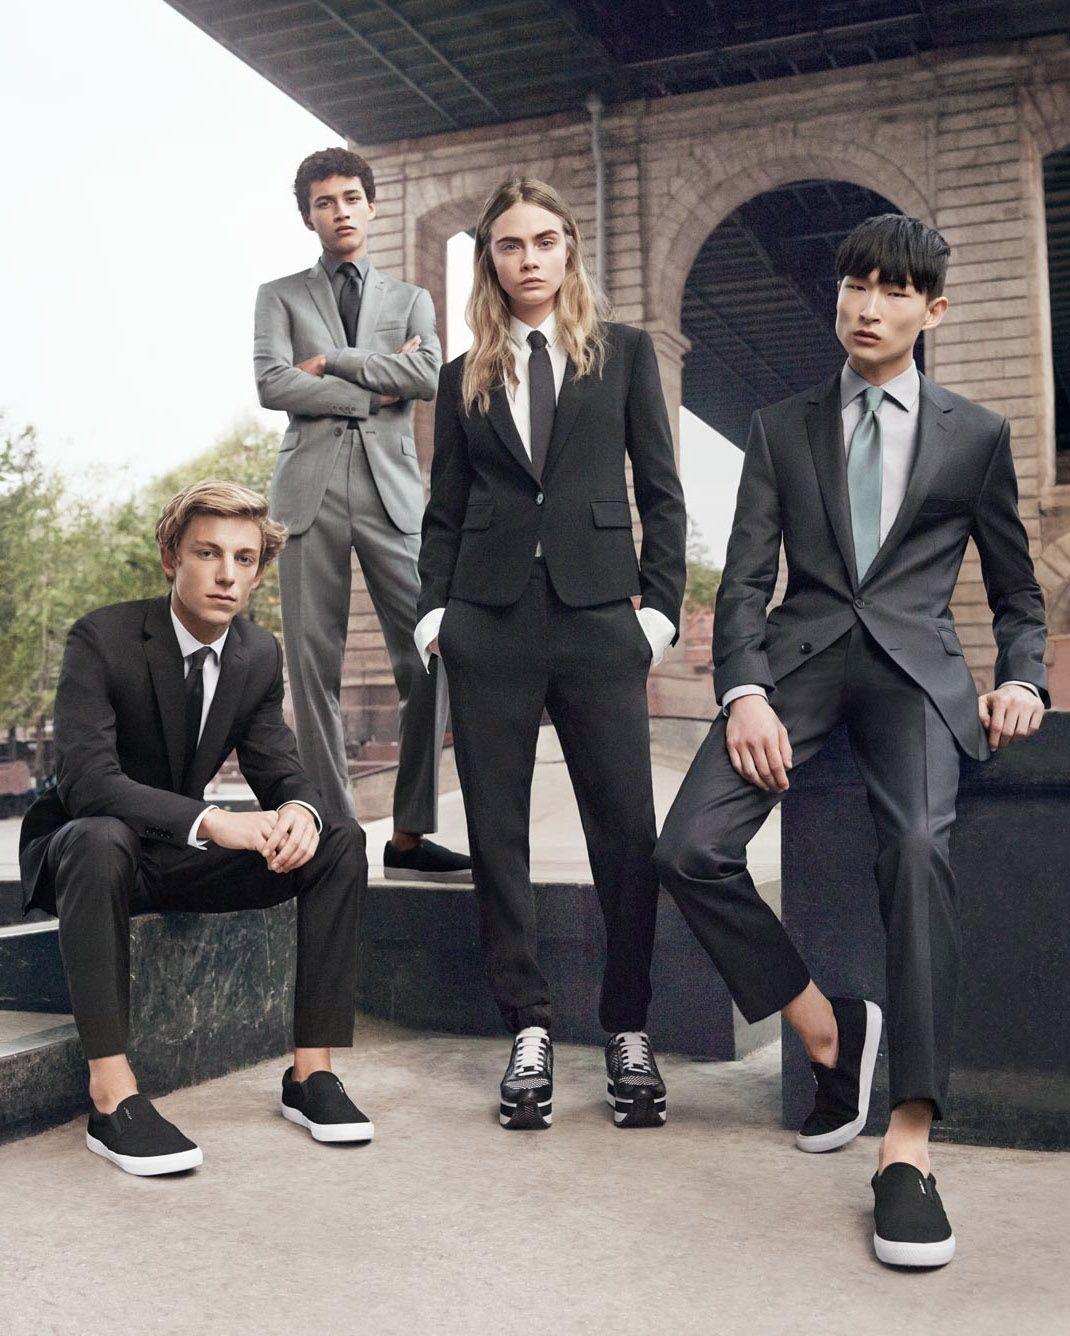 M: Ben Nordberg, Jackson Hale, Jeremy Matos & Cara Delevingne, P: Gregory Harris, S: Jay Massacret (DKNY Menswear SS 2015 Campaign)